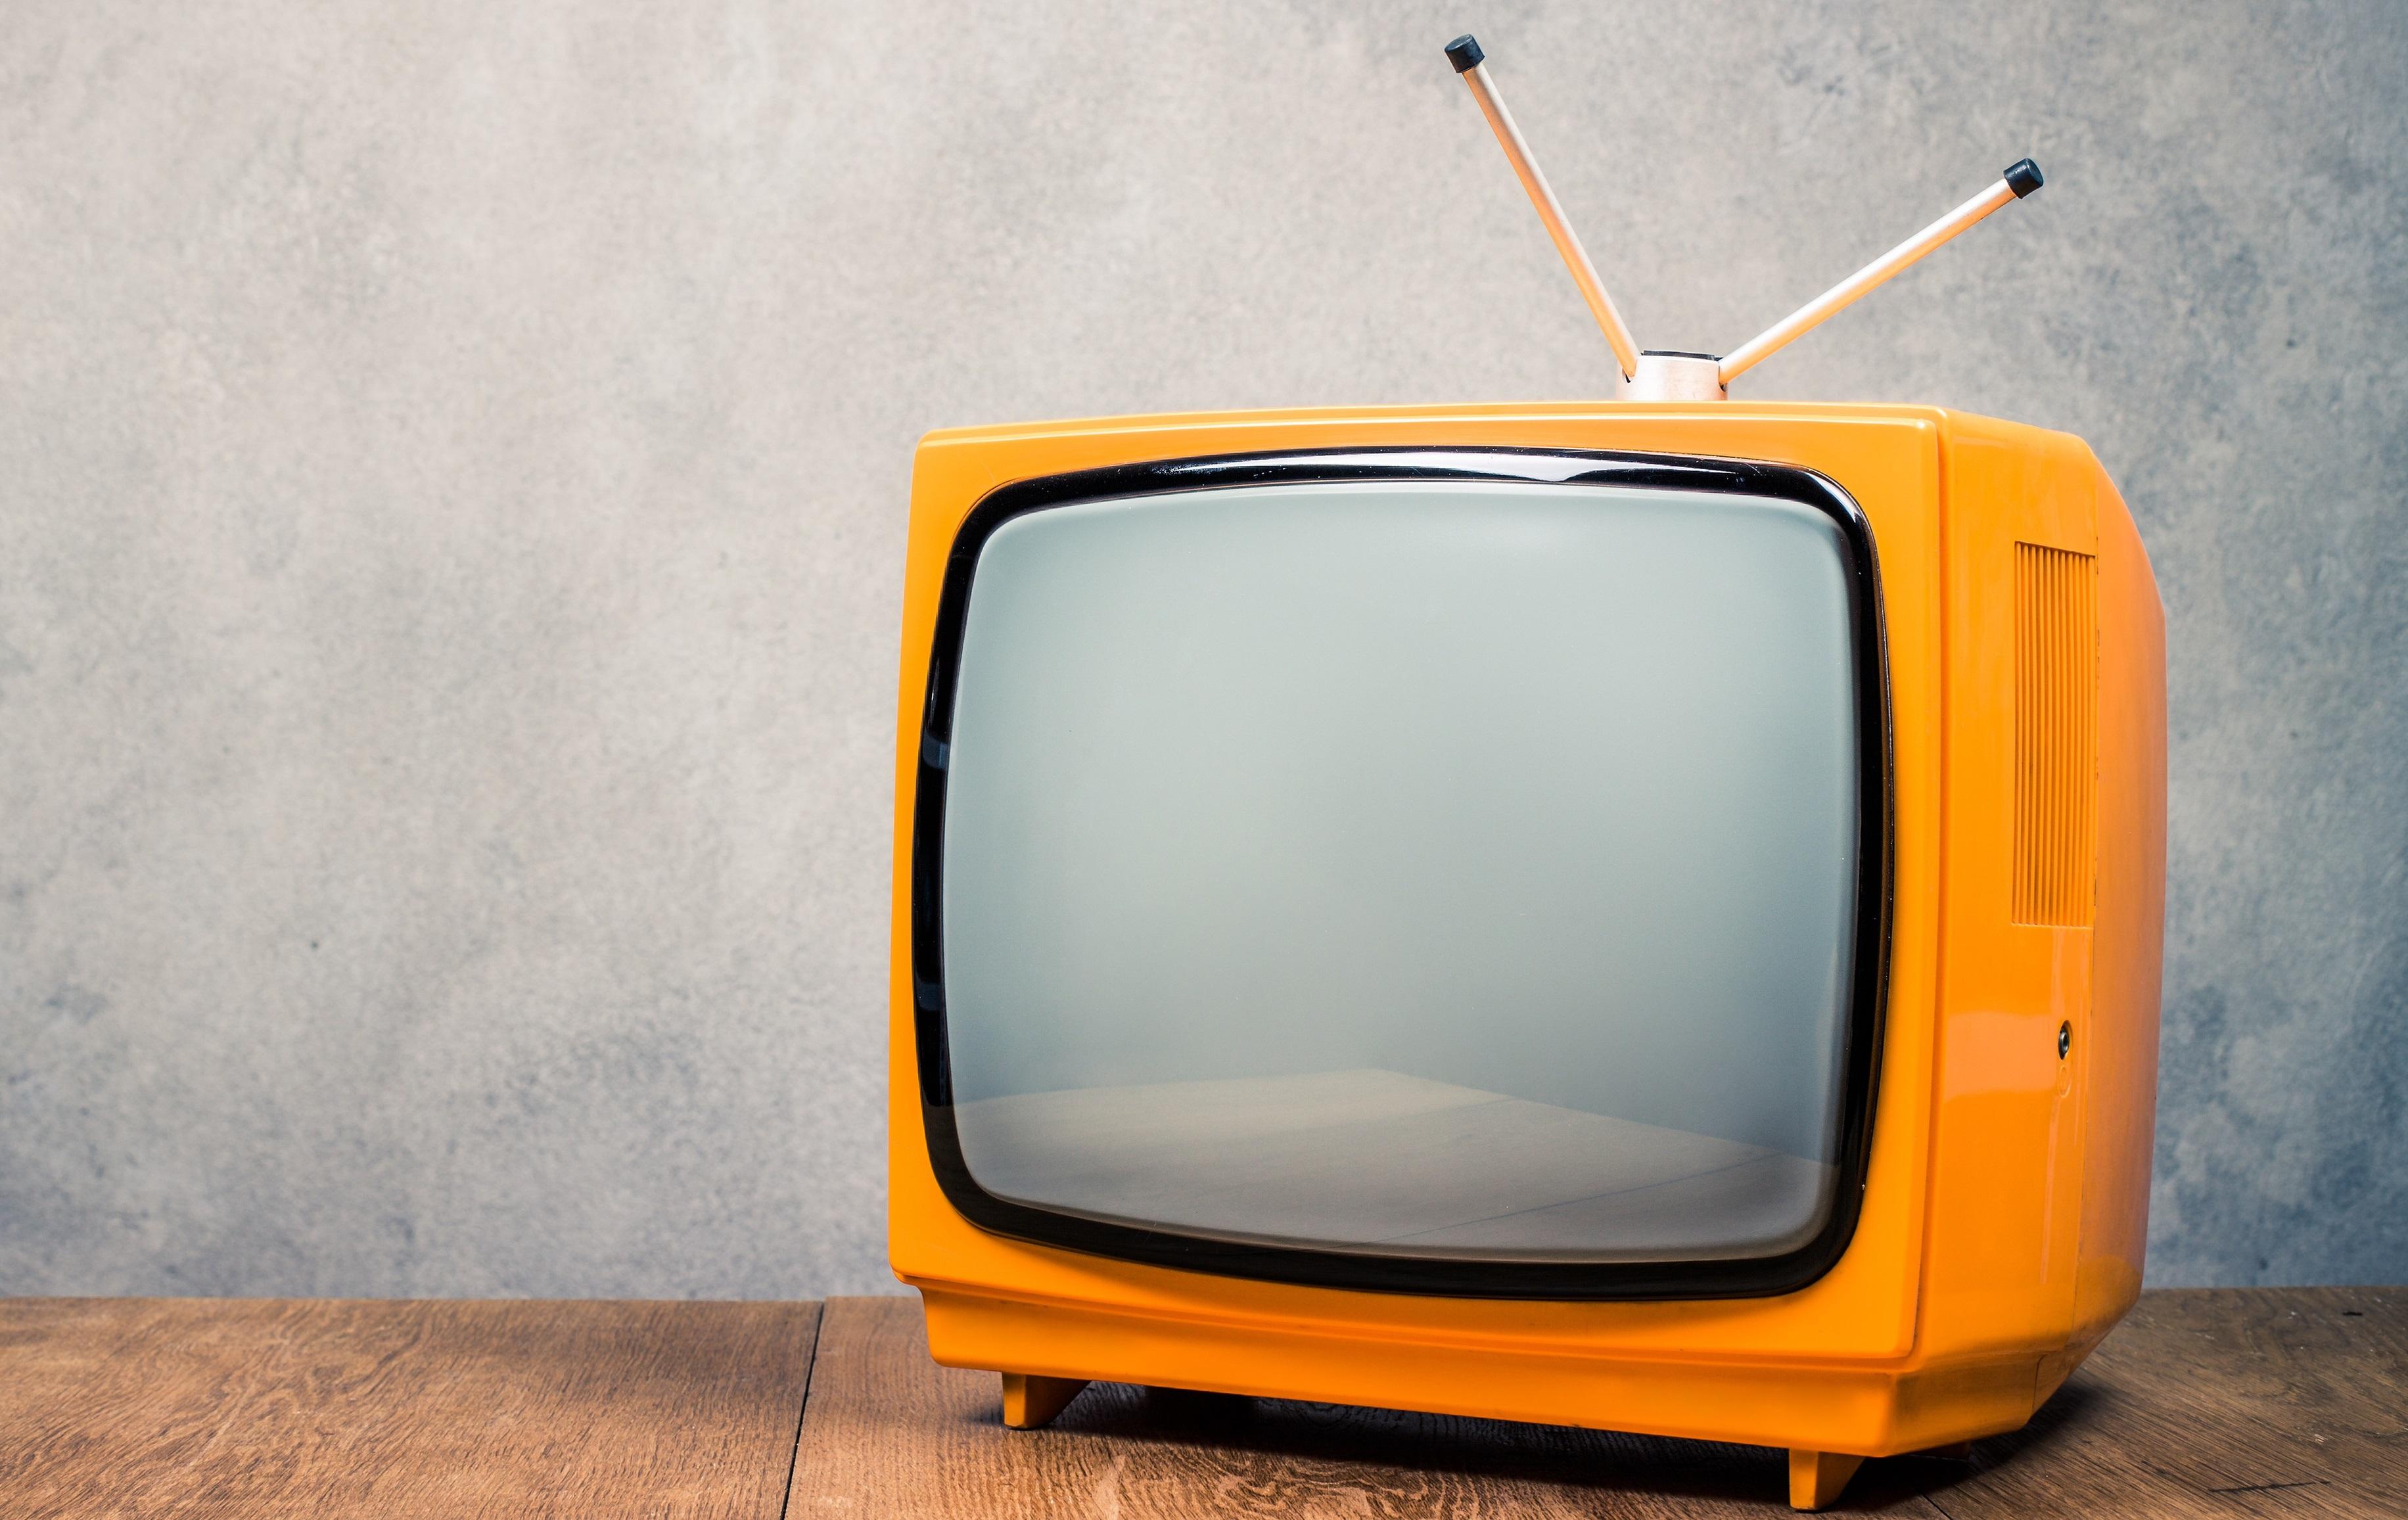 The Seasonal Nature of TV Viewing